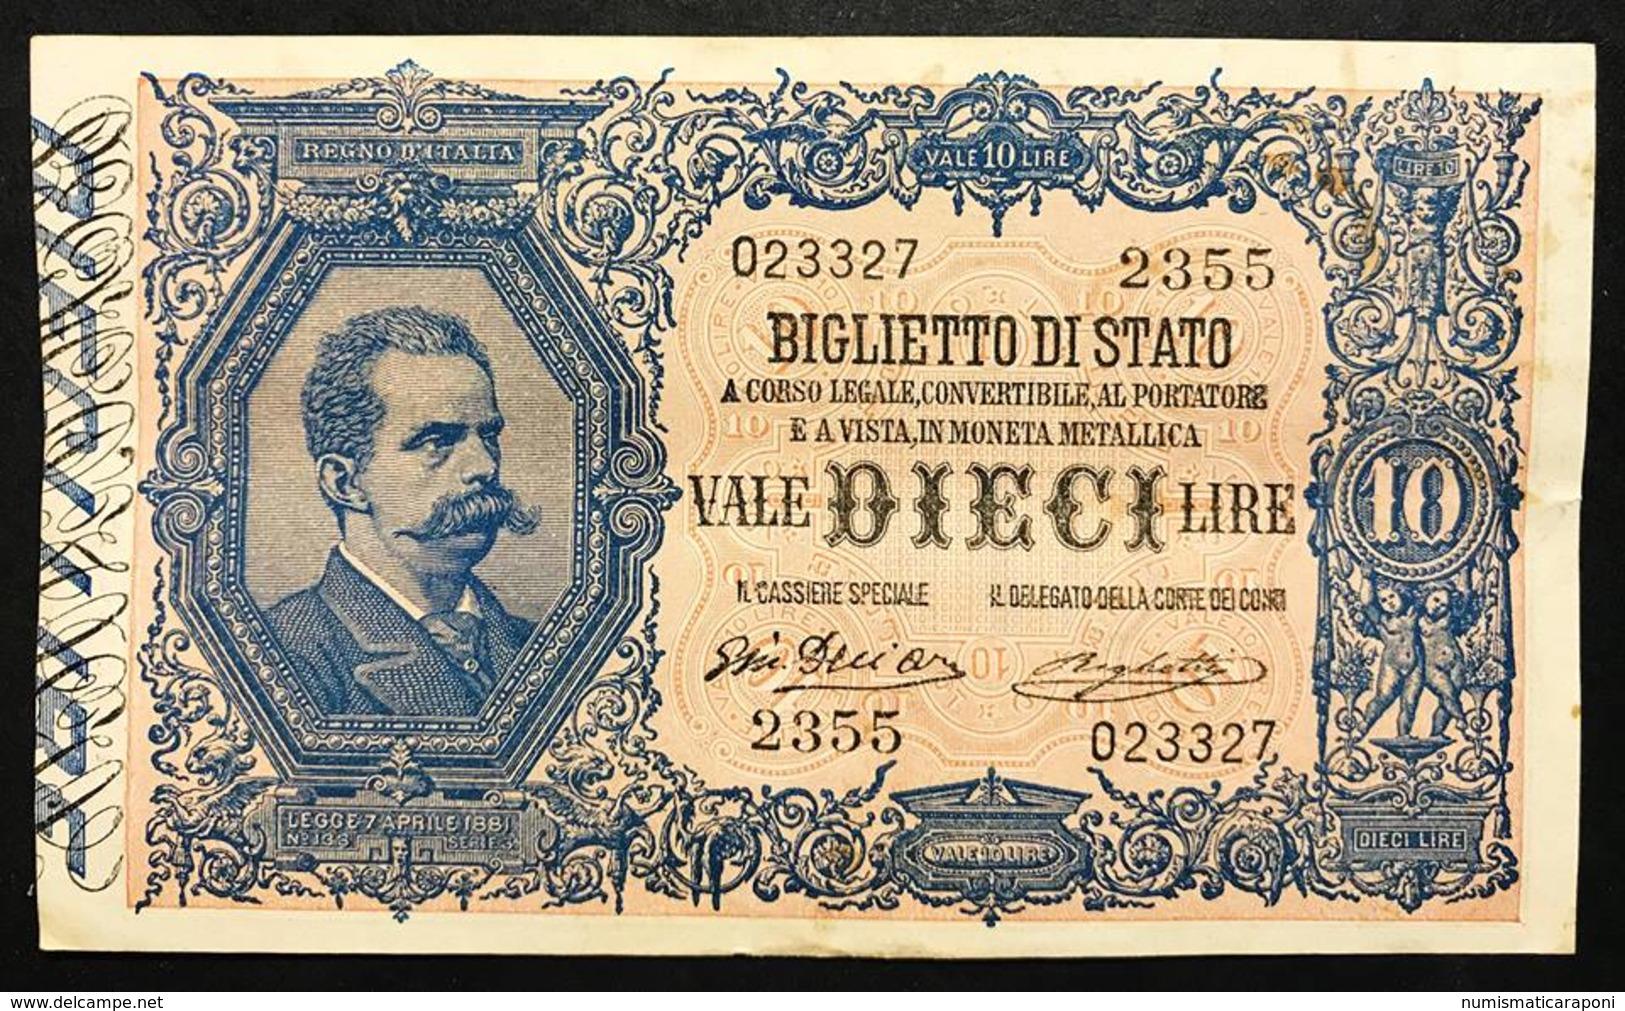 10 LIRE VITTORIO EM. III° 11 10 1915 RARA Spl Naturale  LOTTO 1373 - Italia – 10 Lire